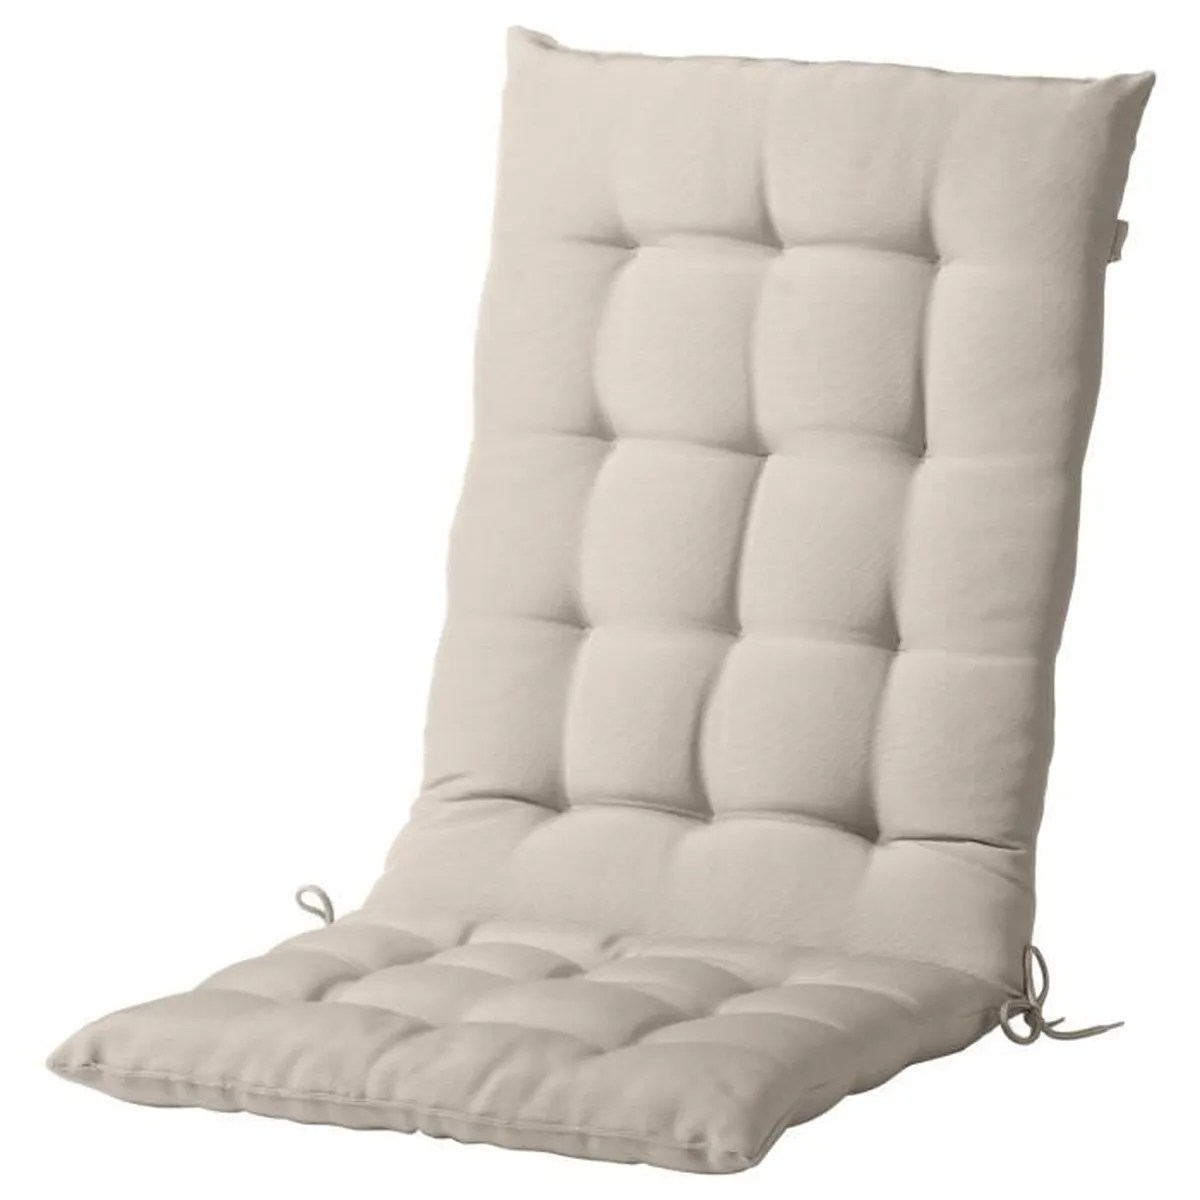 Coussin Assise Dossier Couleur Beige Pour Chaise Terrasse Ou